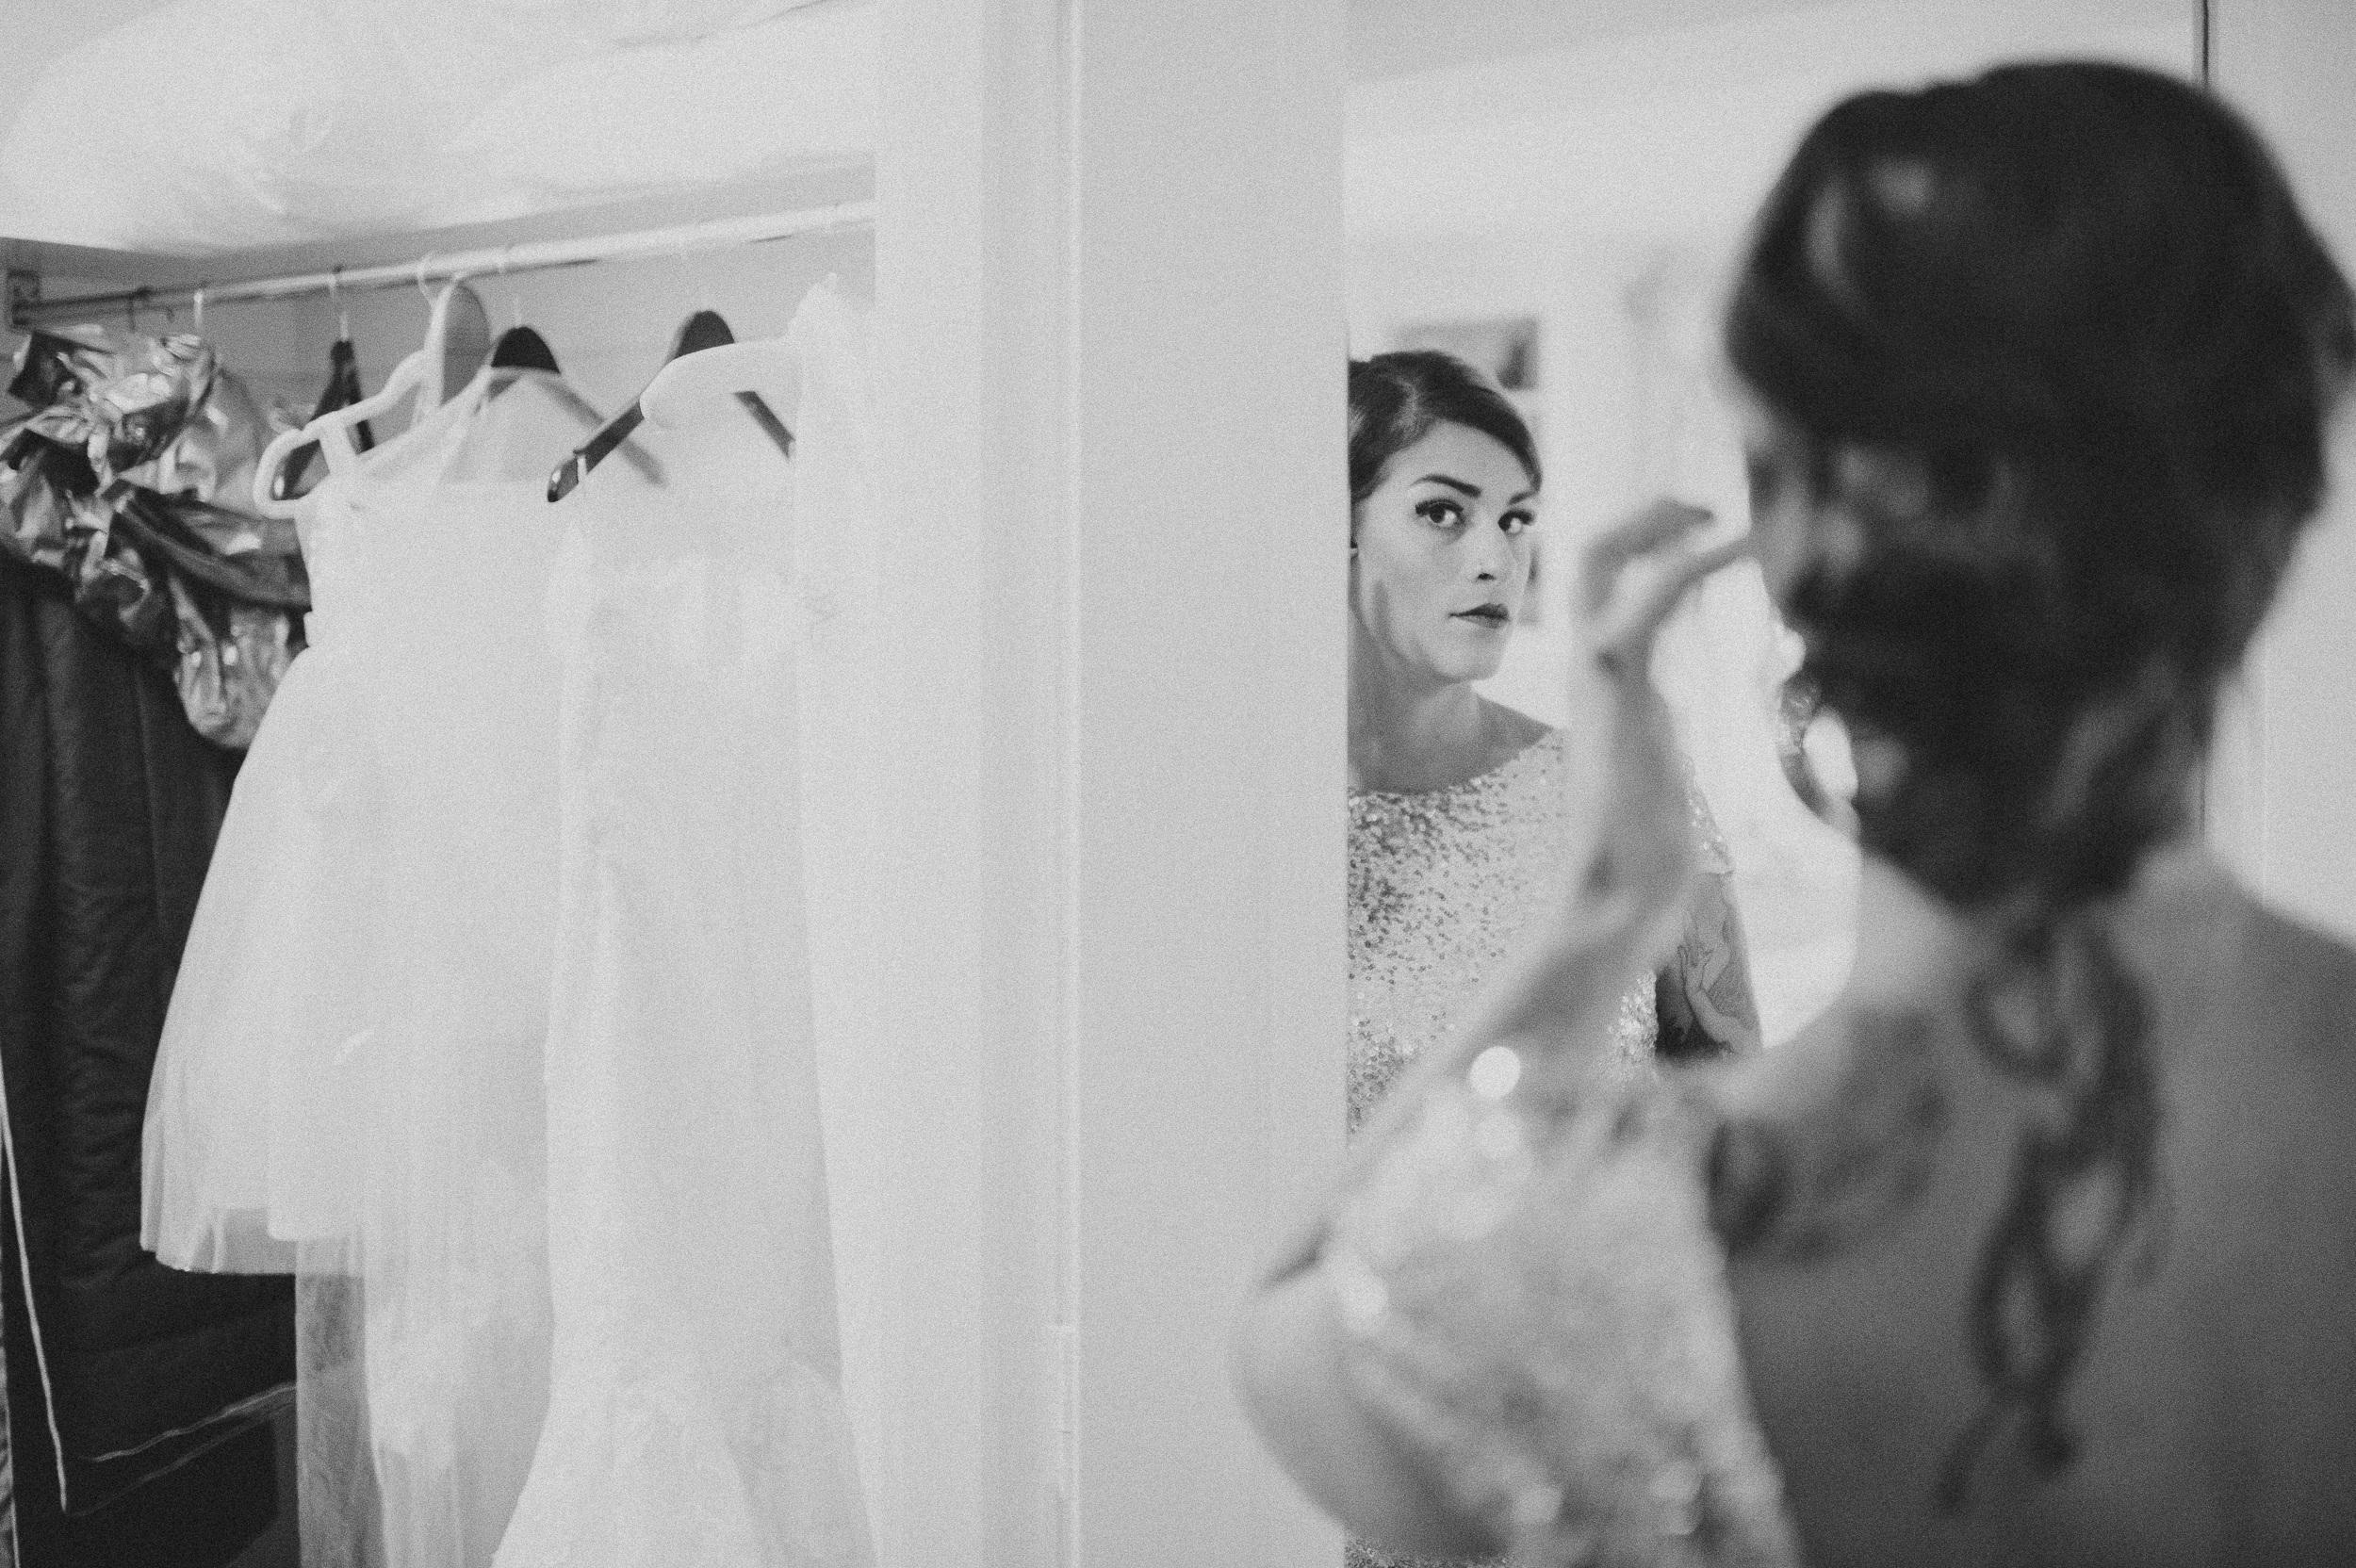 delaware-estate-wedding-photographer-pat-robinson-photography-18.jpg